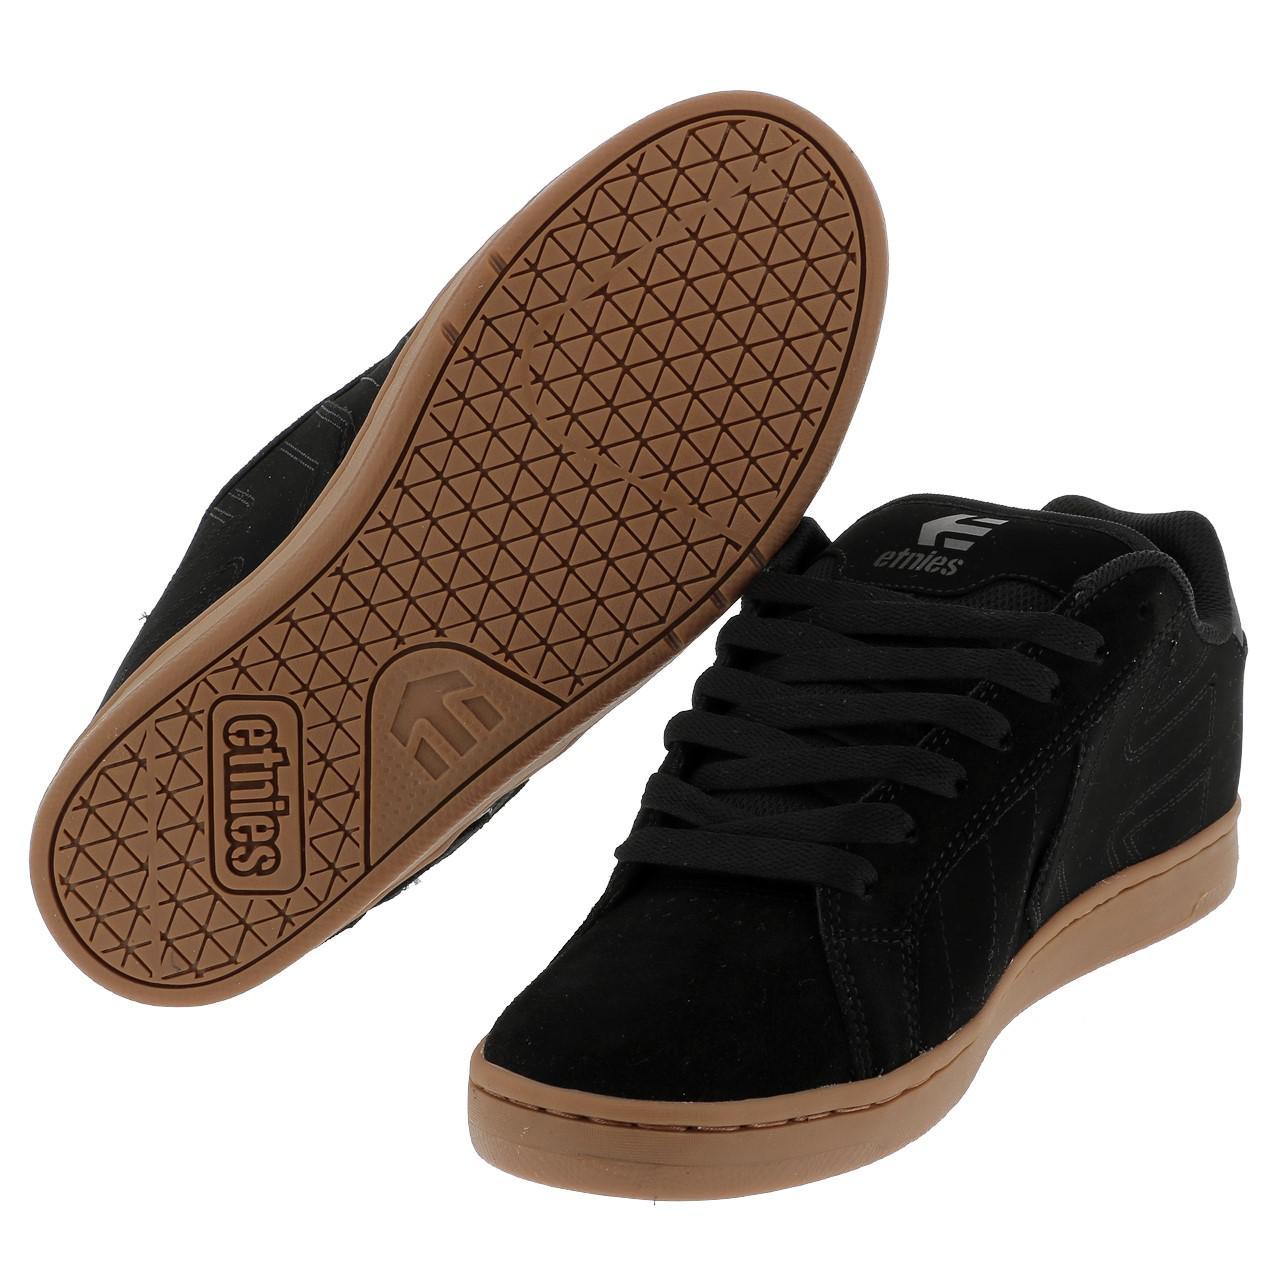 Shoes-Skateboard-Etnies-Fader-Black-Grey-Gum-Black-39127-New thumbnail 5